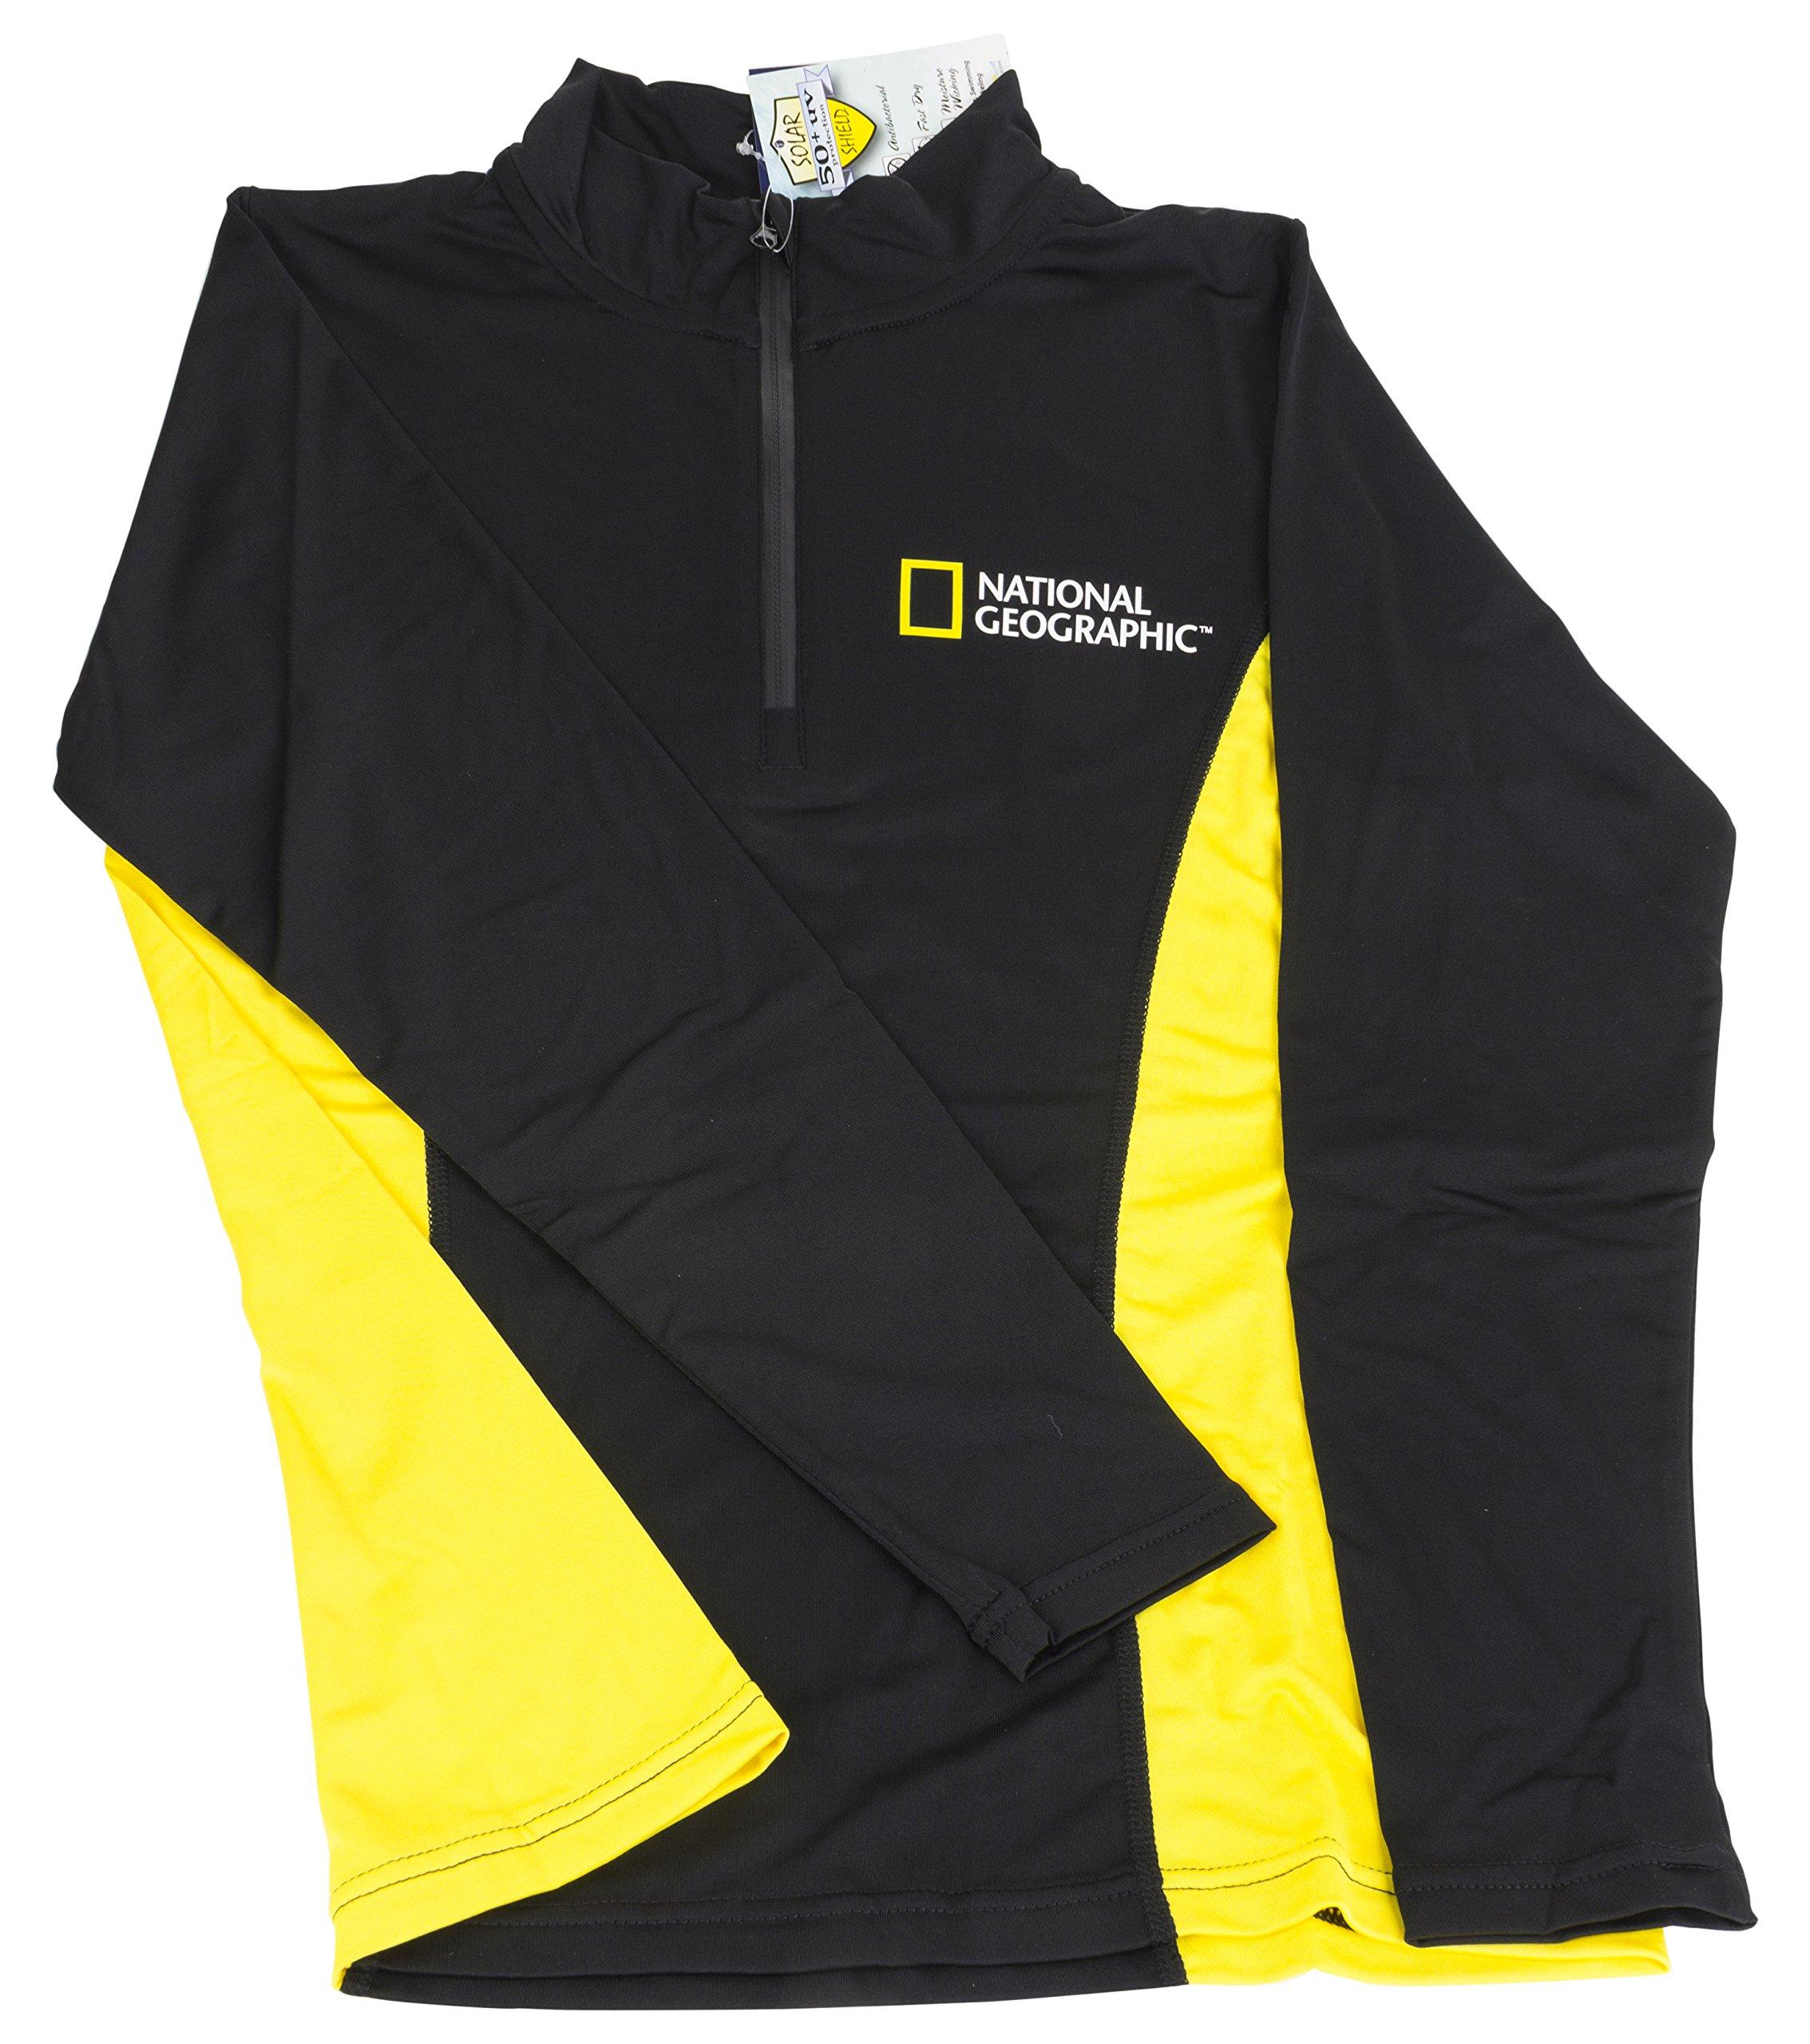 National Geographic Snorkeler 6252 Long Sleeve Rash Ladies Classic Black/Yellow X-Large, Black